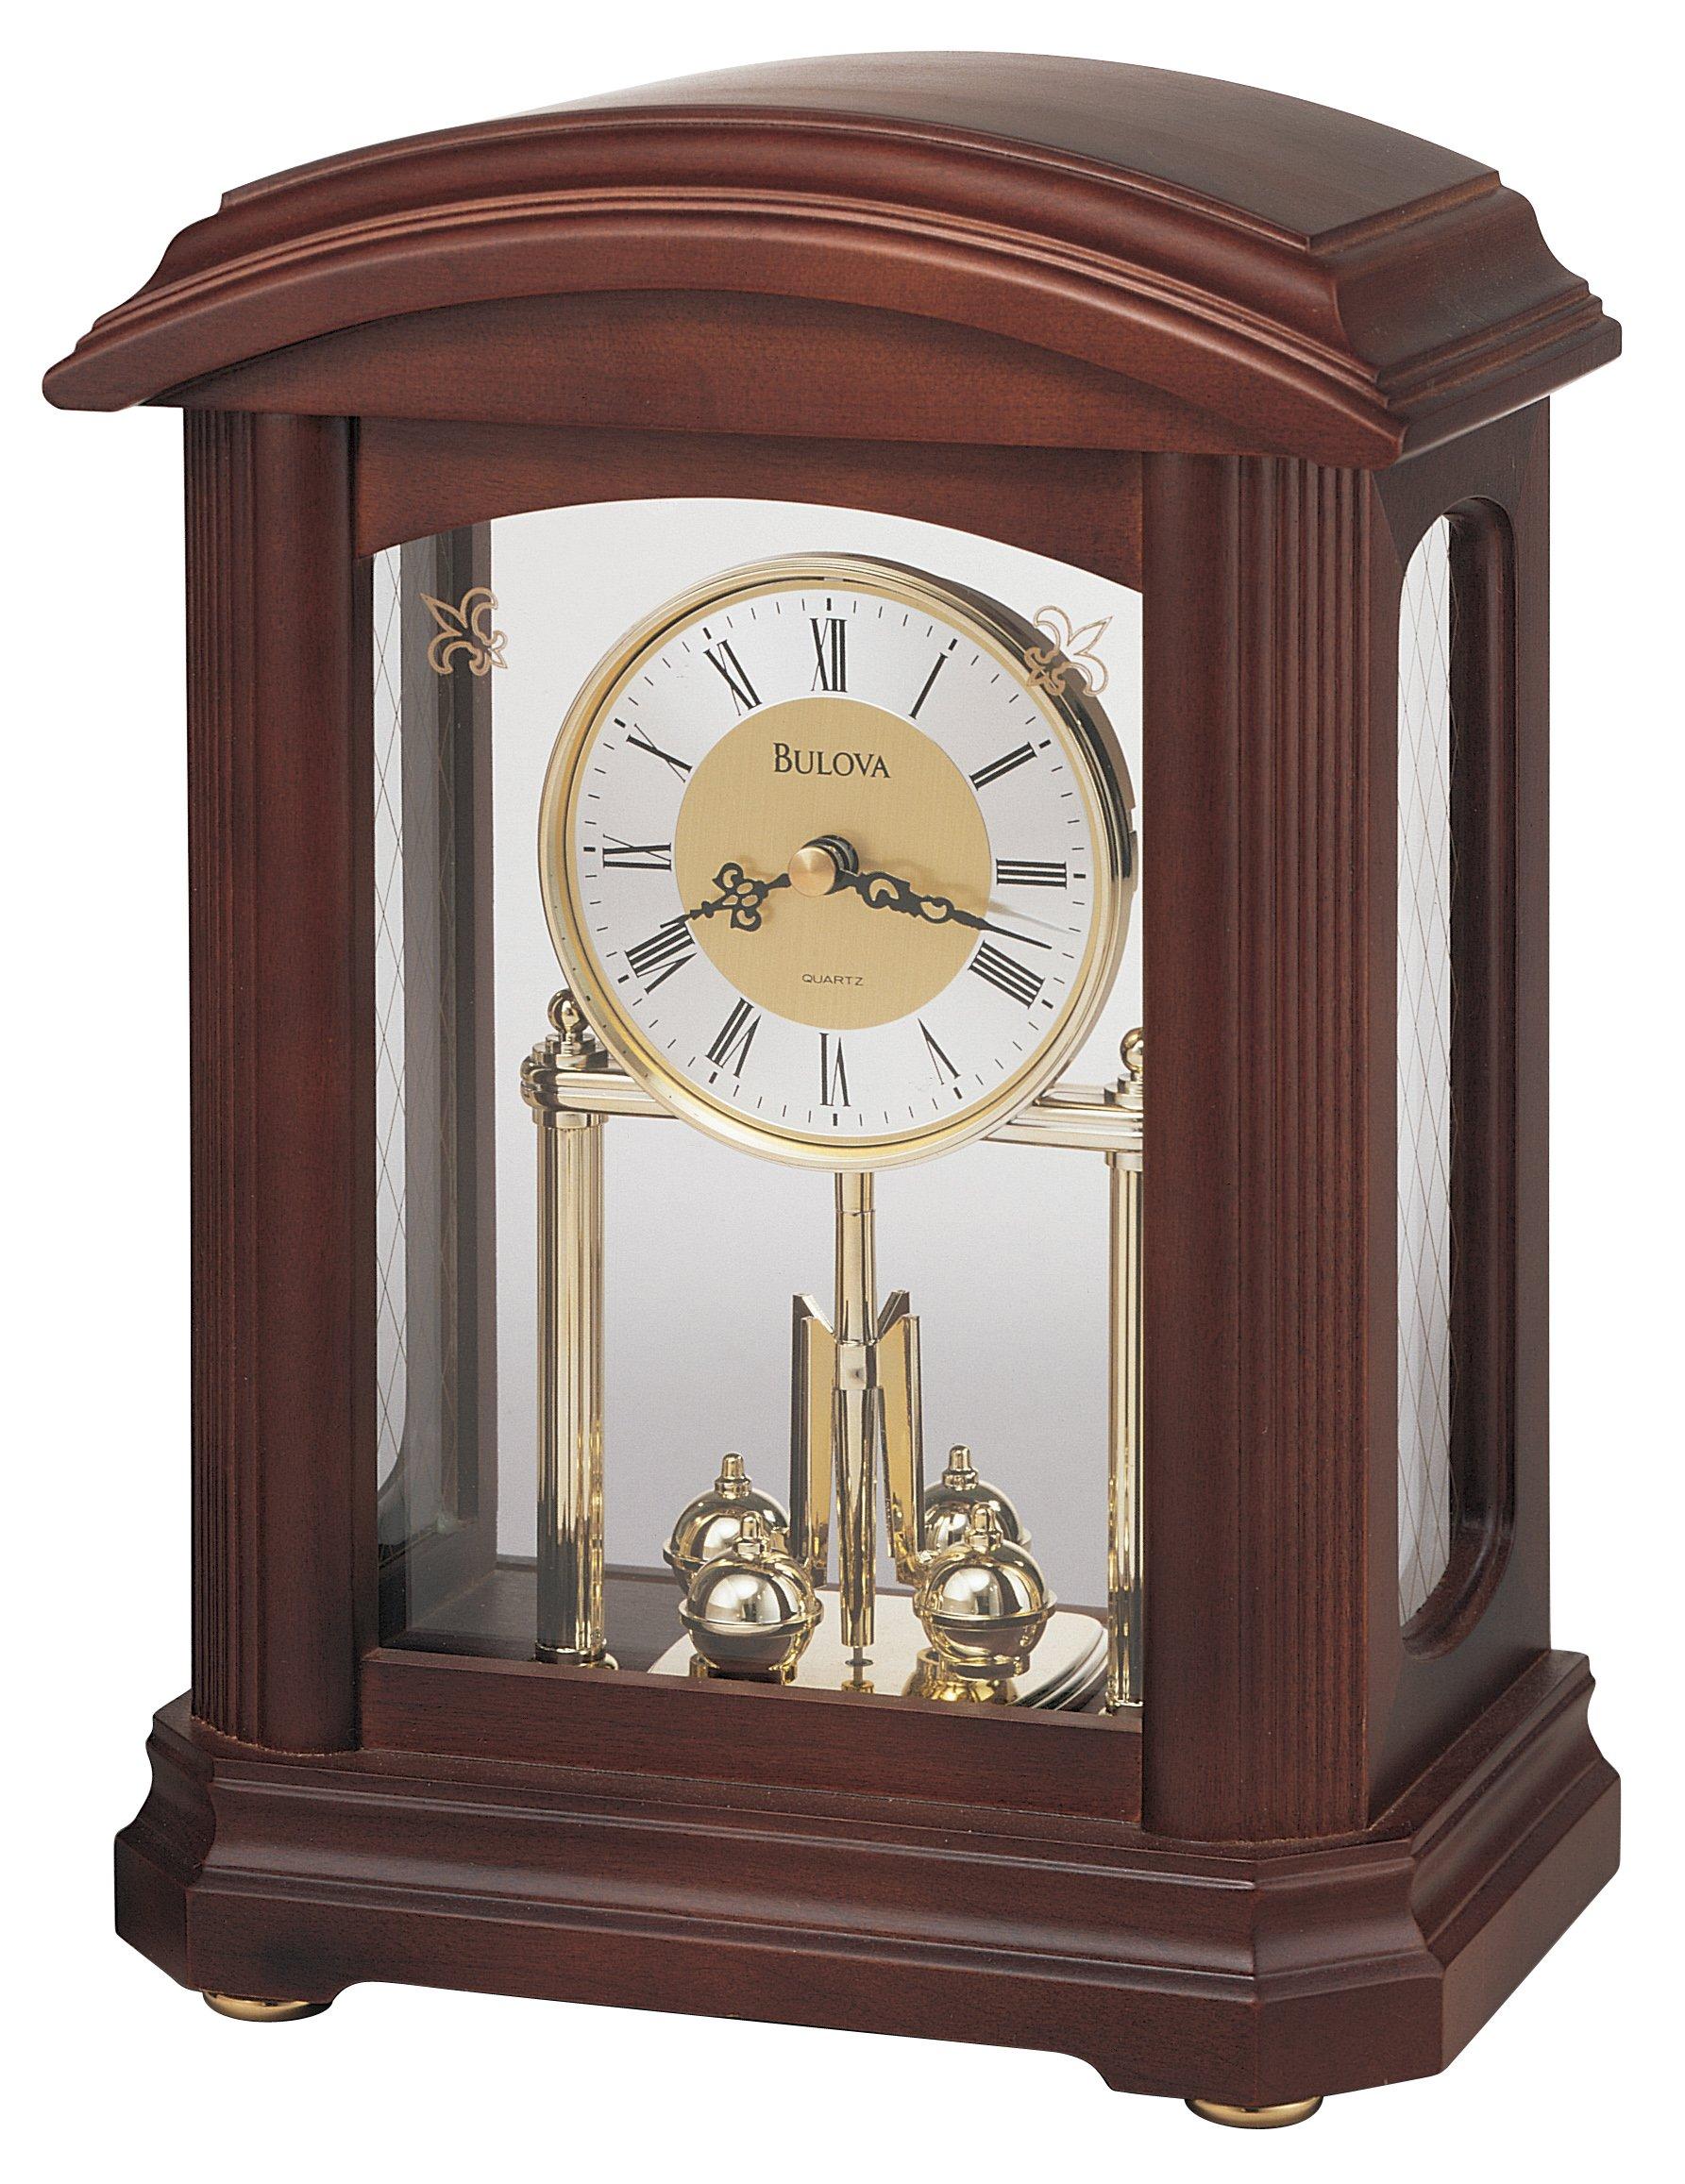 Bulova B1848 Nordale Clock, Walnut Finish by Bulova